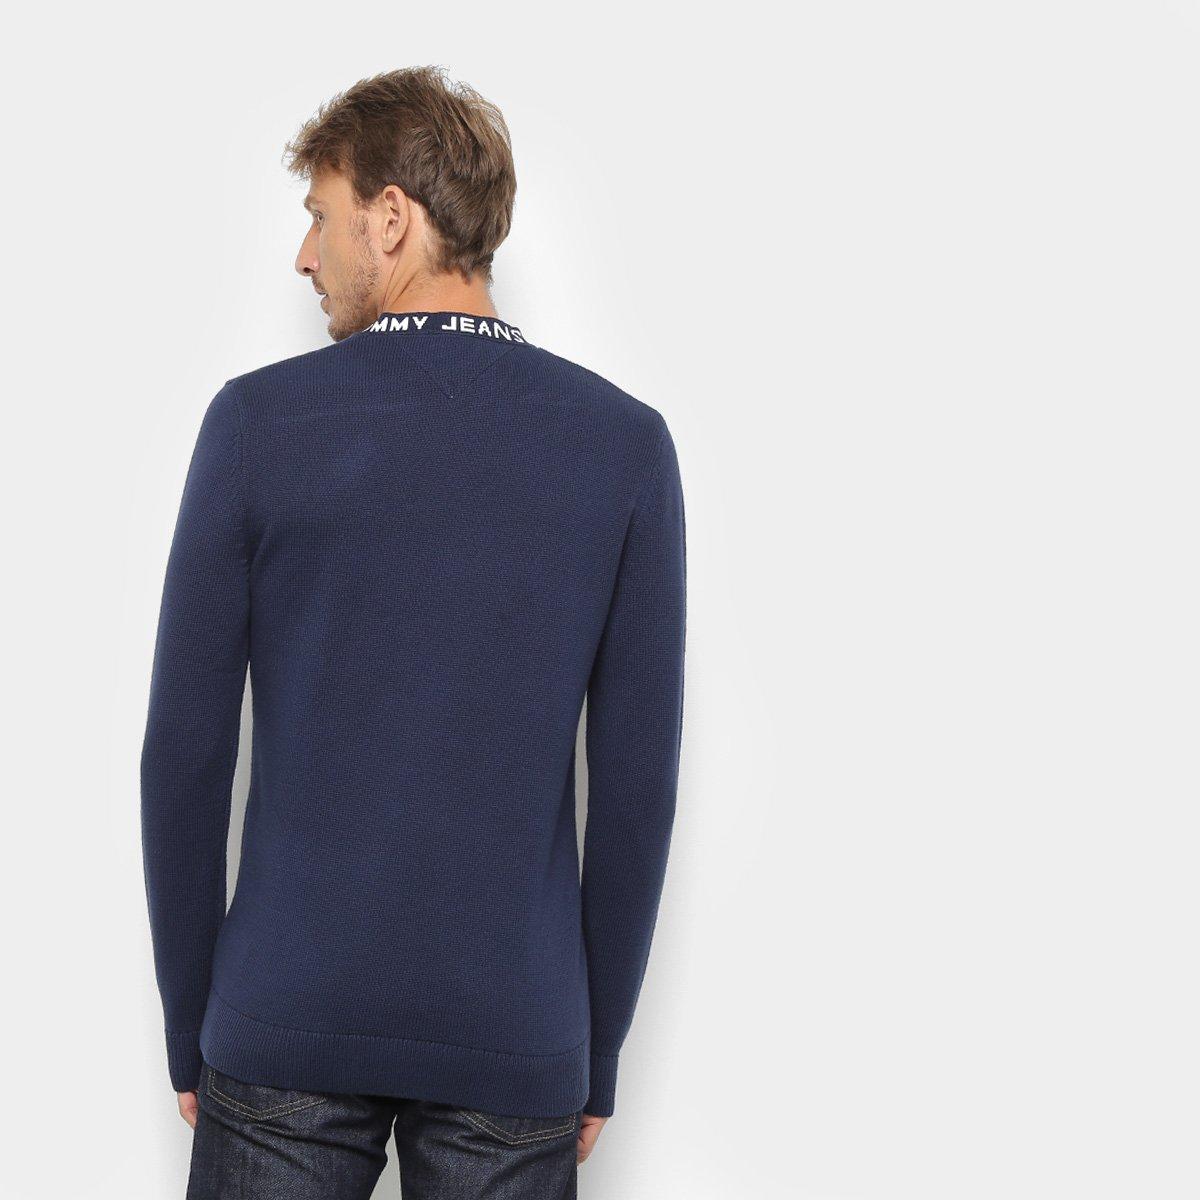 Foto 2 - Suéter em Tricô Tommy Jeans Masculino